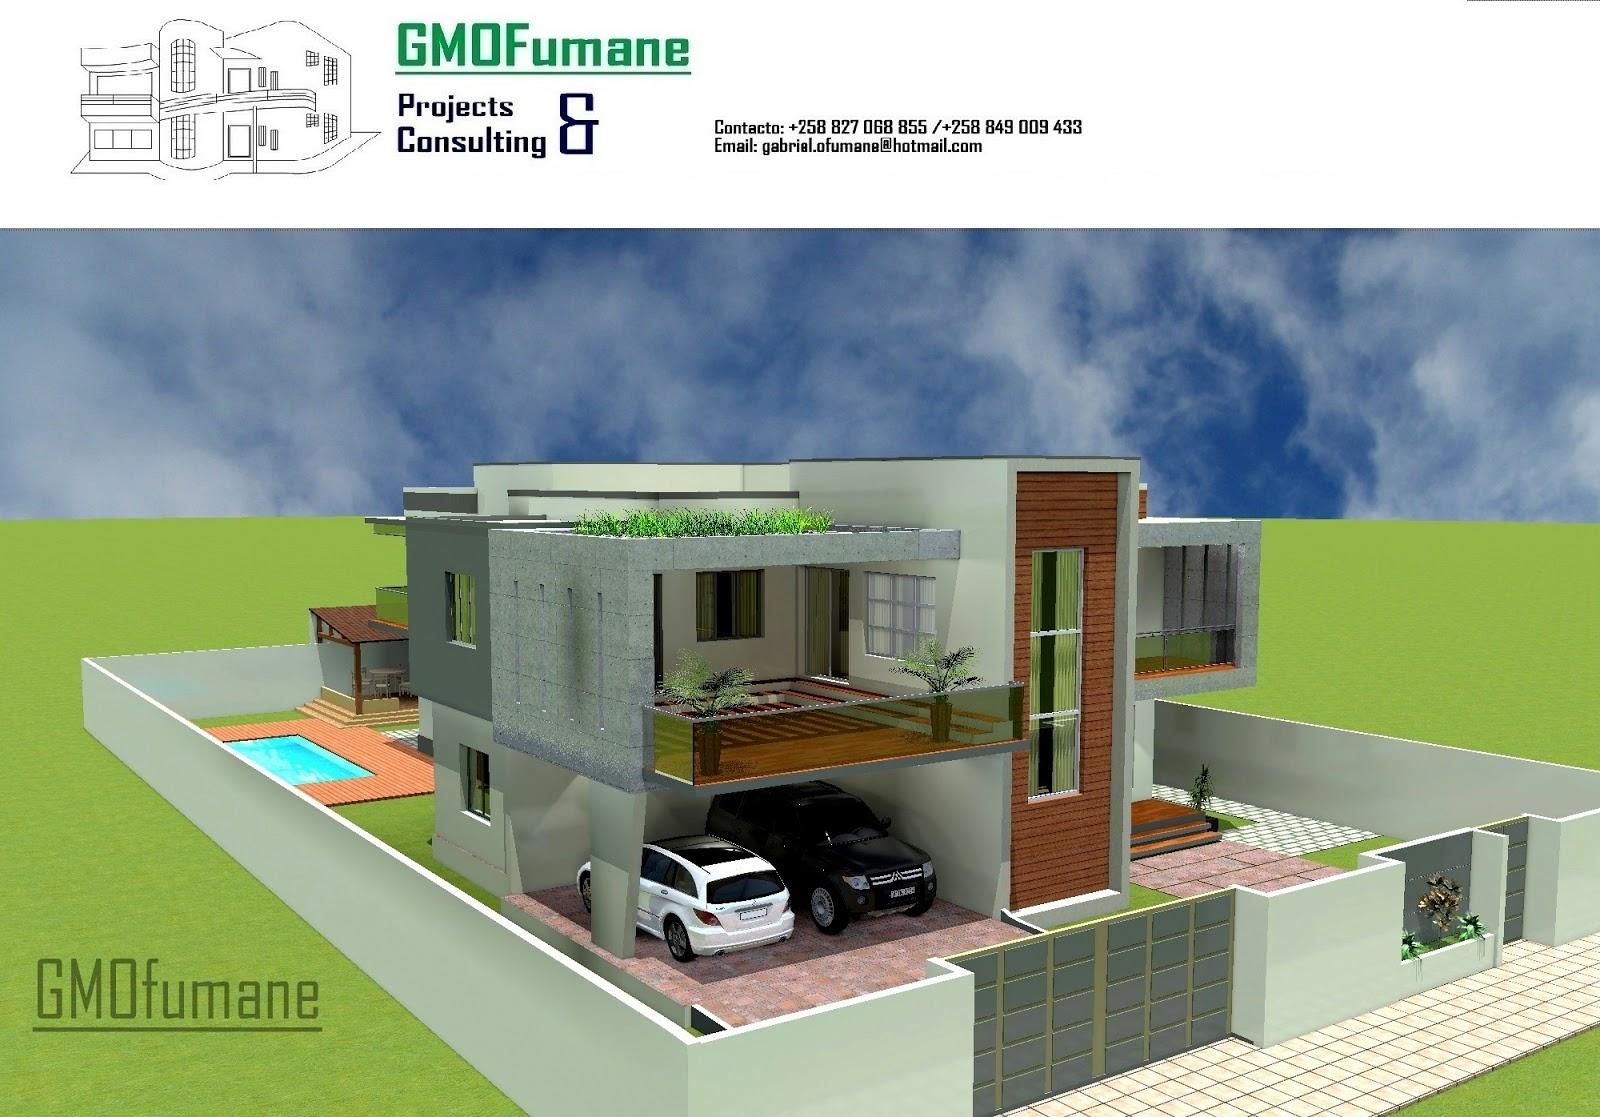 Gmofumane projectos e consultoria for Casa moderna de 7 00m x 15 00m